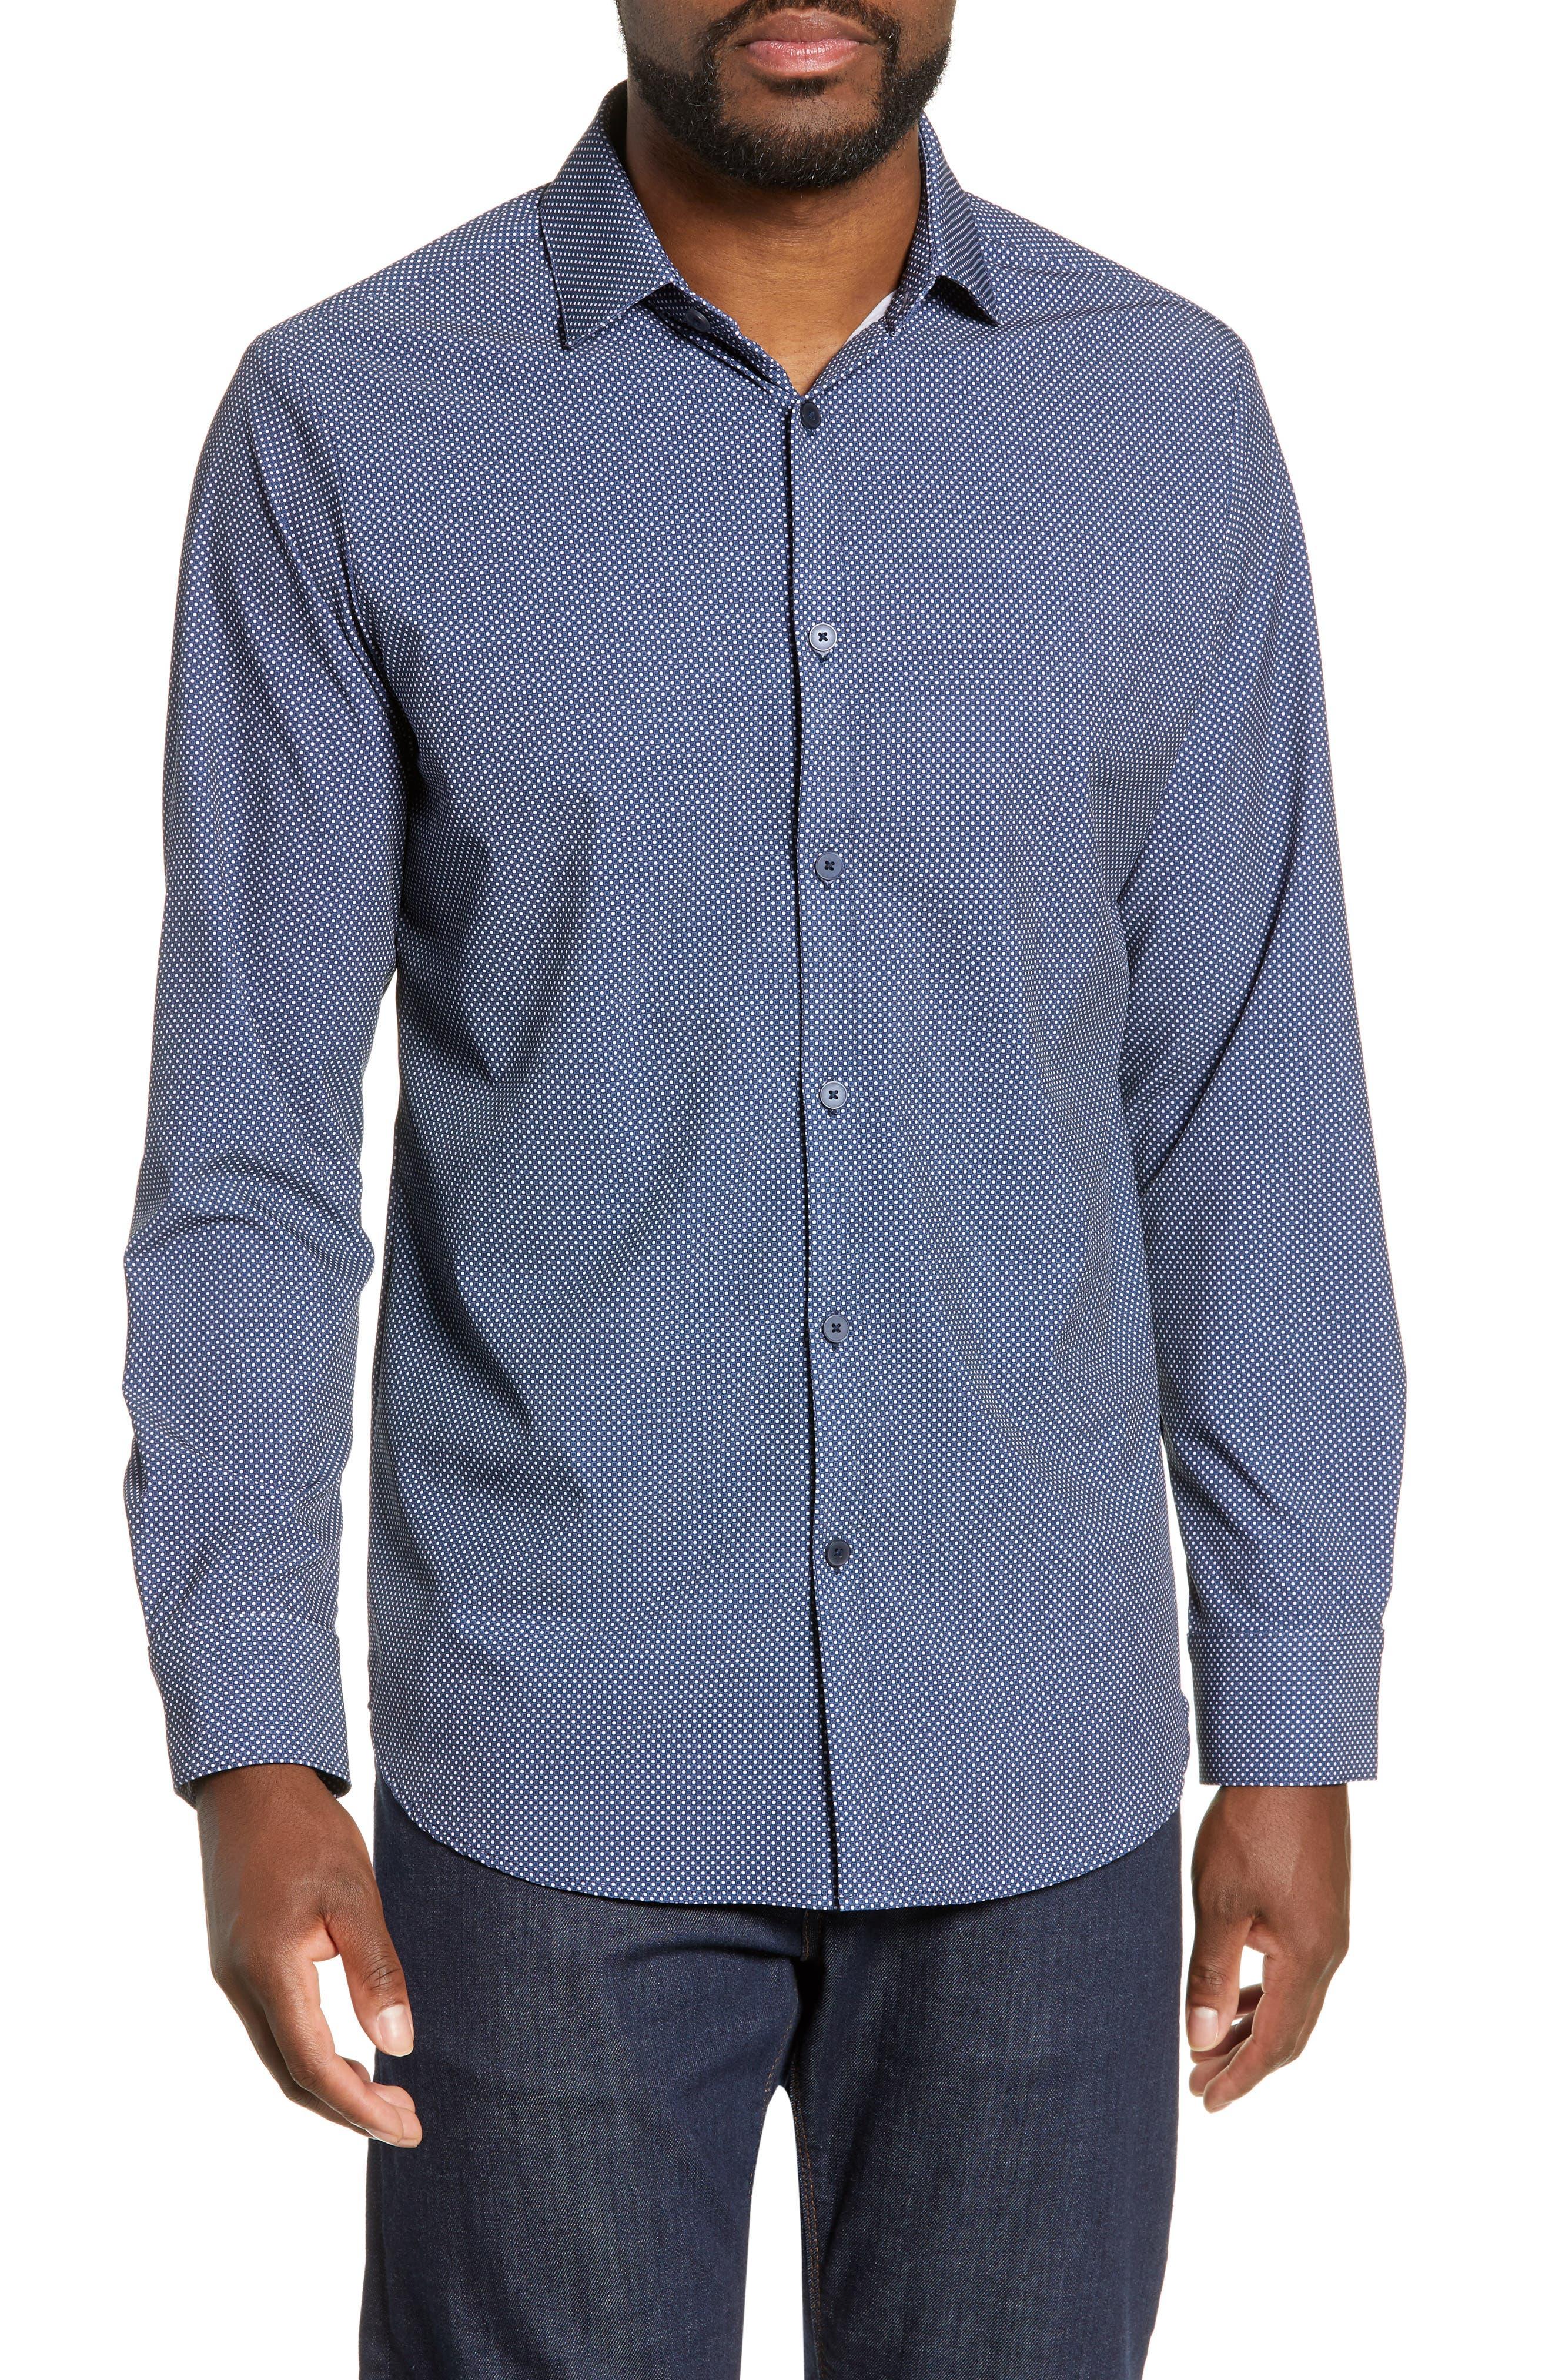 Murray Trim Fit Plaid Performance Sport Shirt, Main, color, NAVY